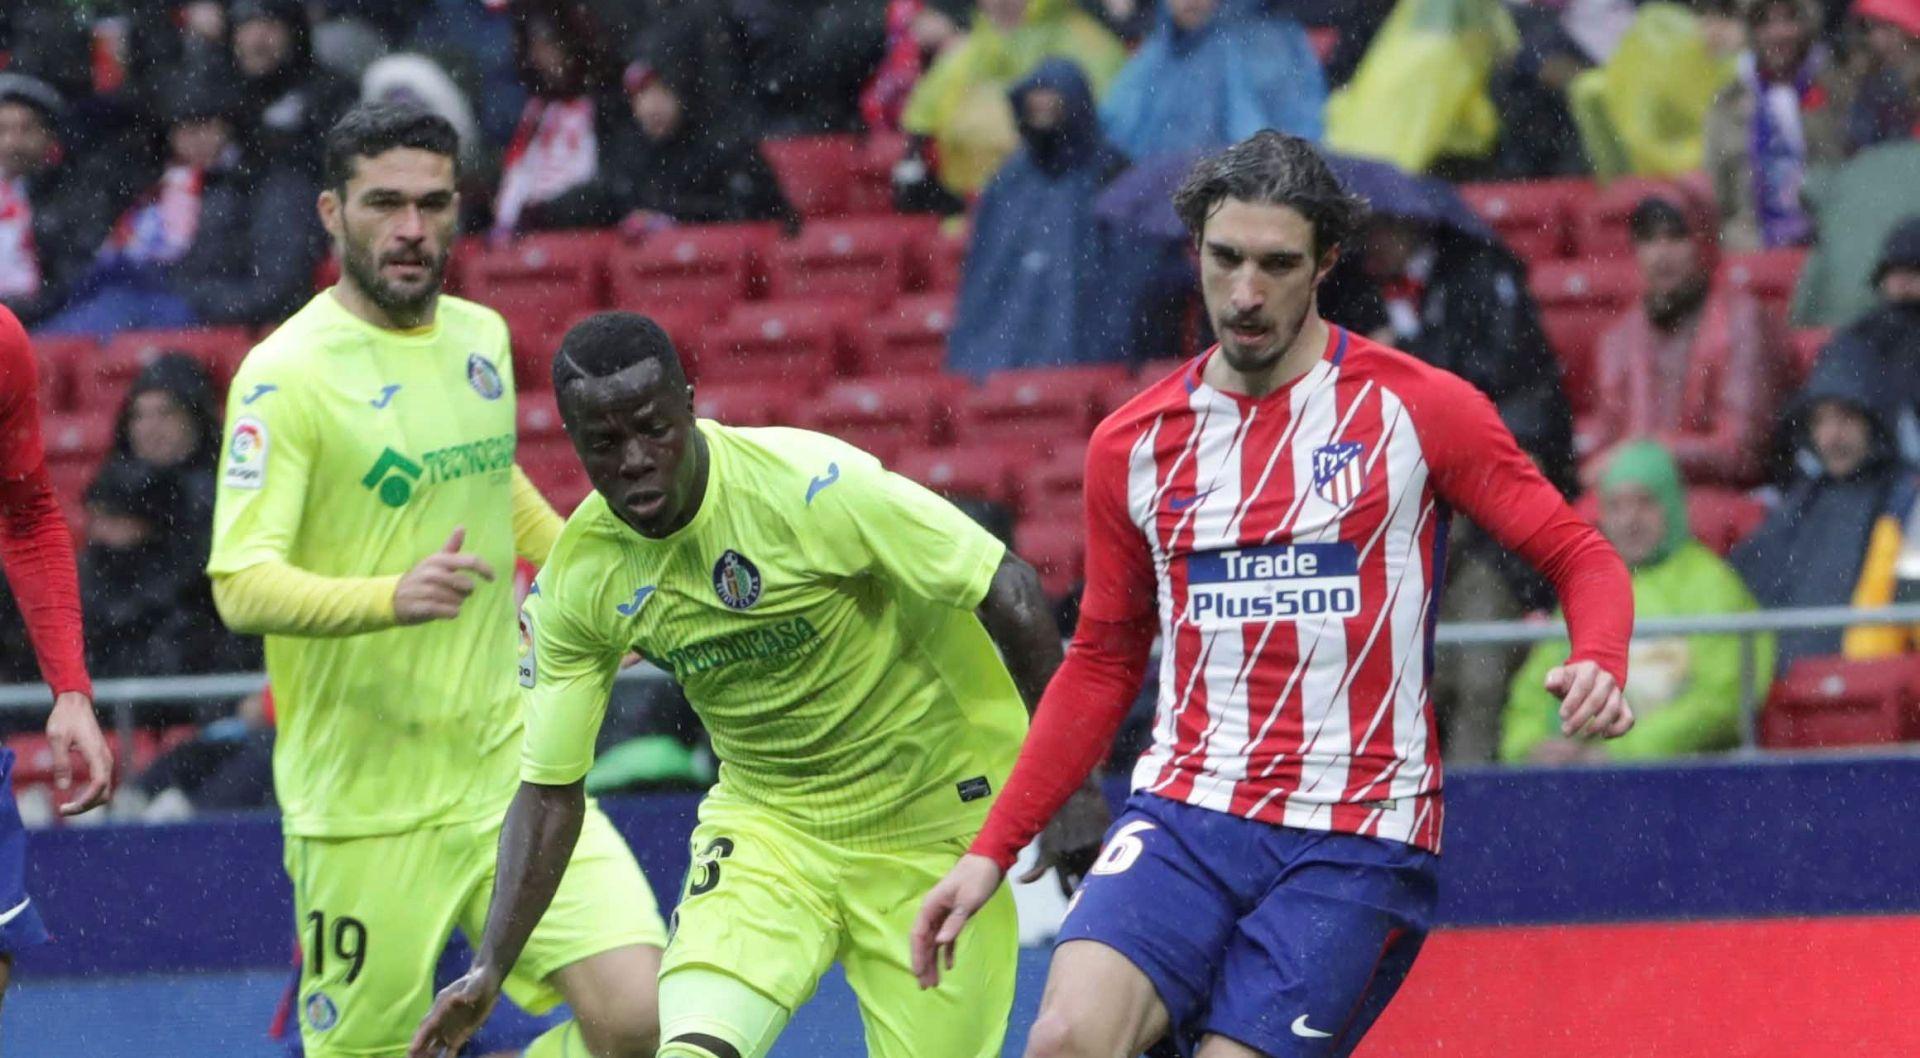 Španjolska: Atletico – Celta 3-0, Vrsaljku 90 minuta